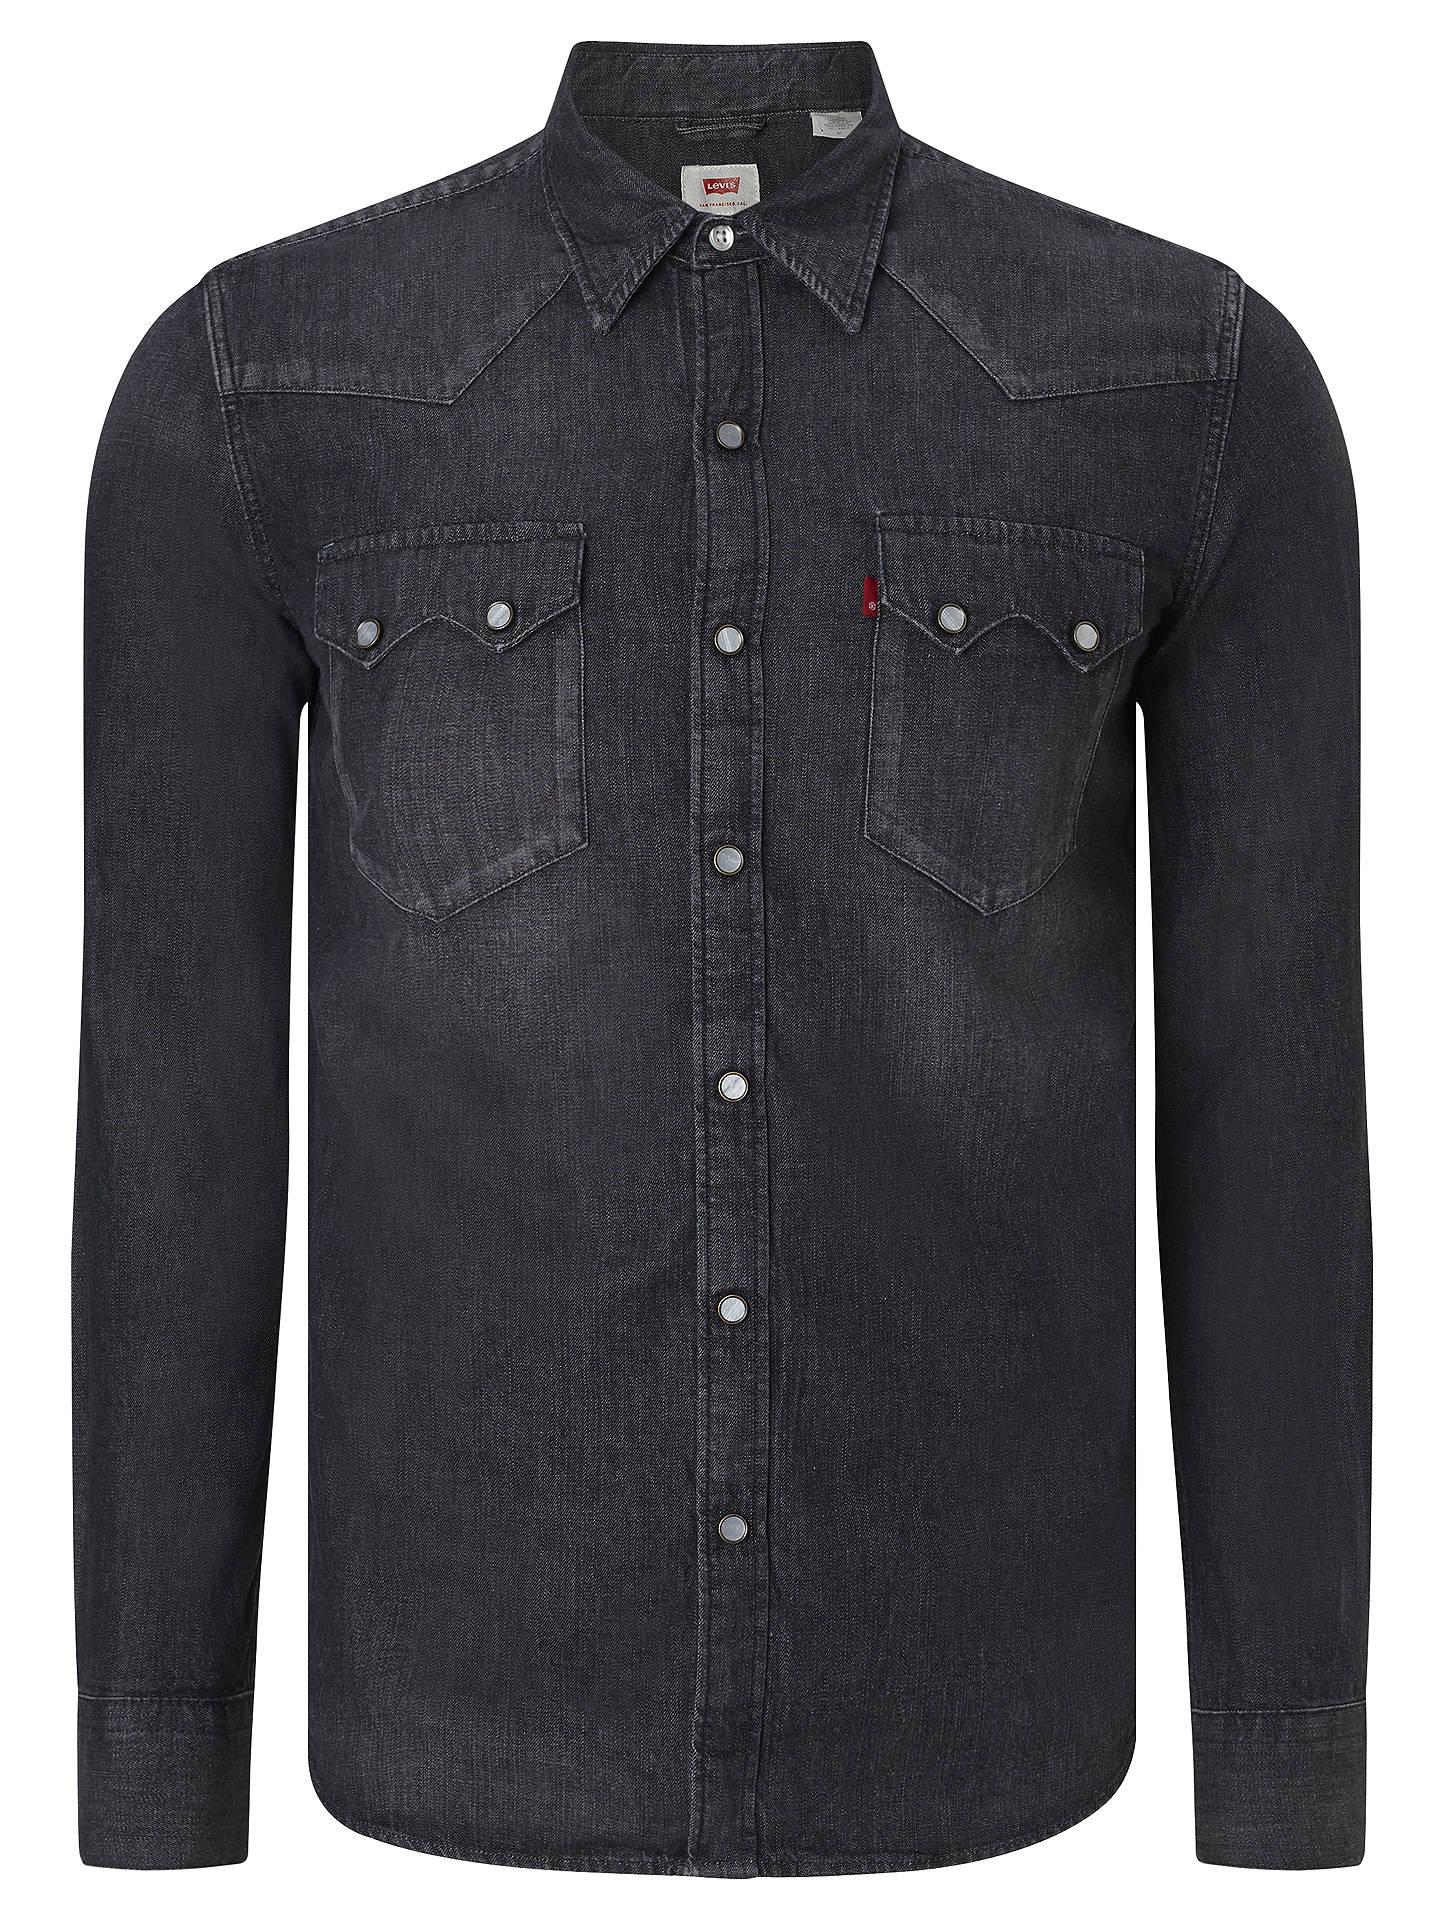 3d03ff4343 Buy Levi s 1955 Sawtooth Denim Shirt